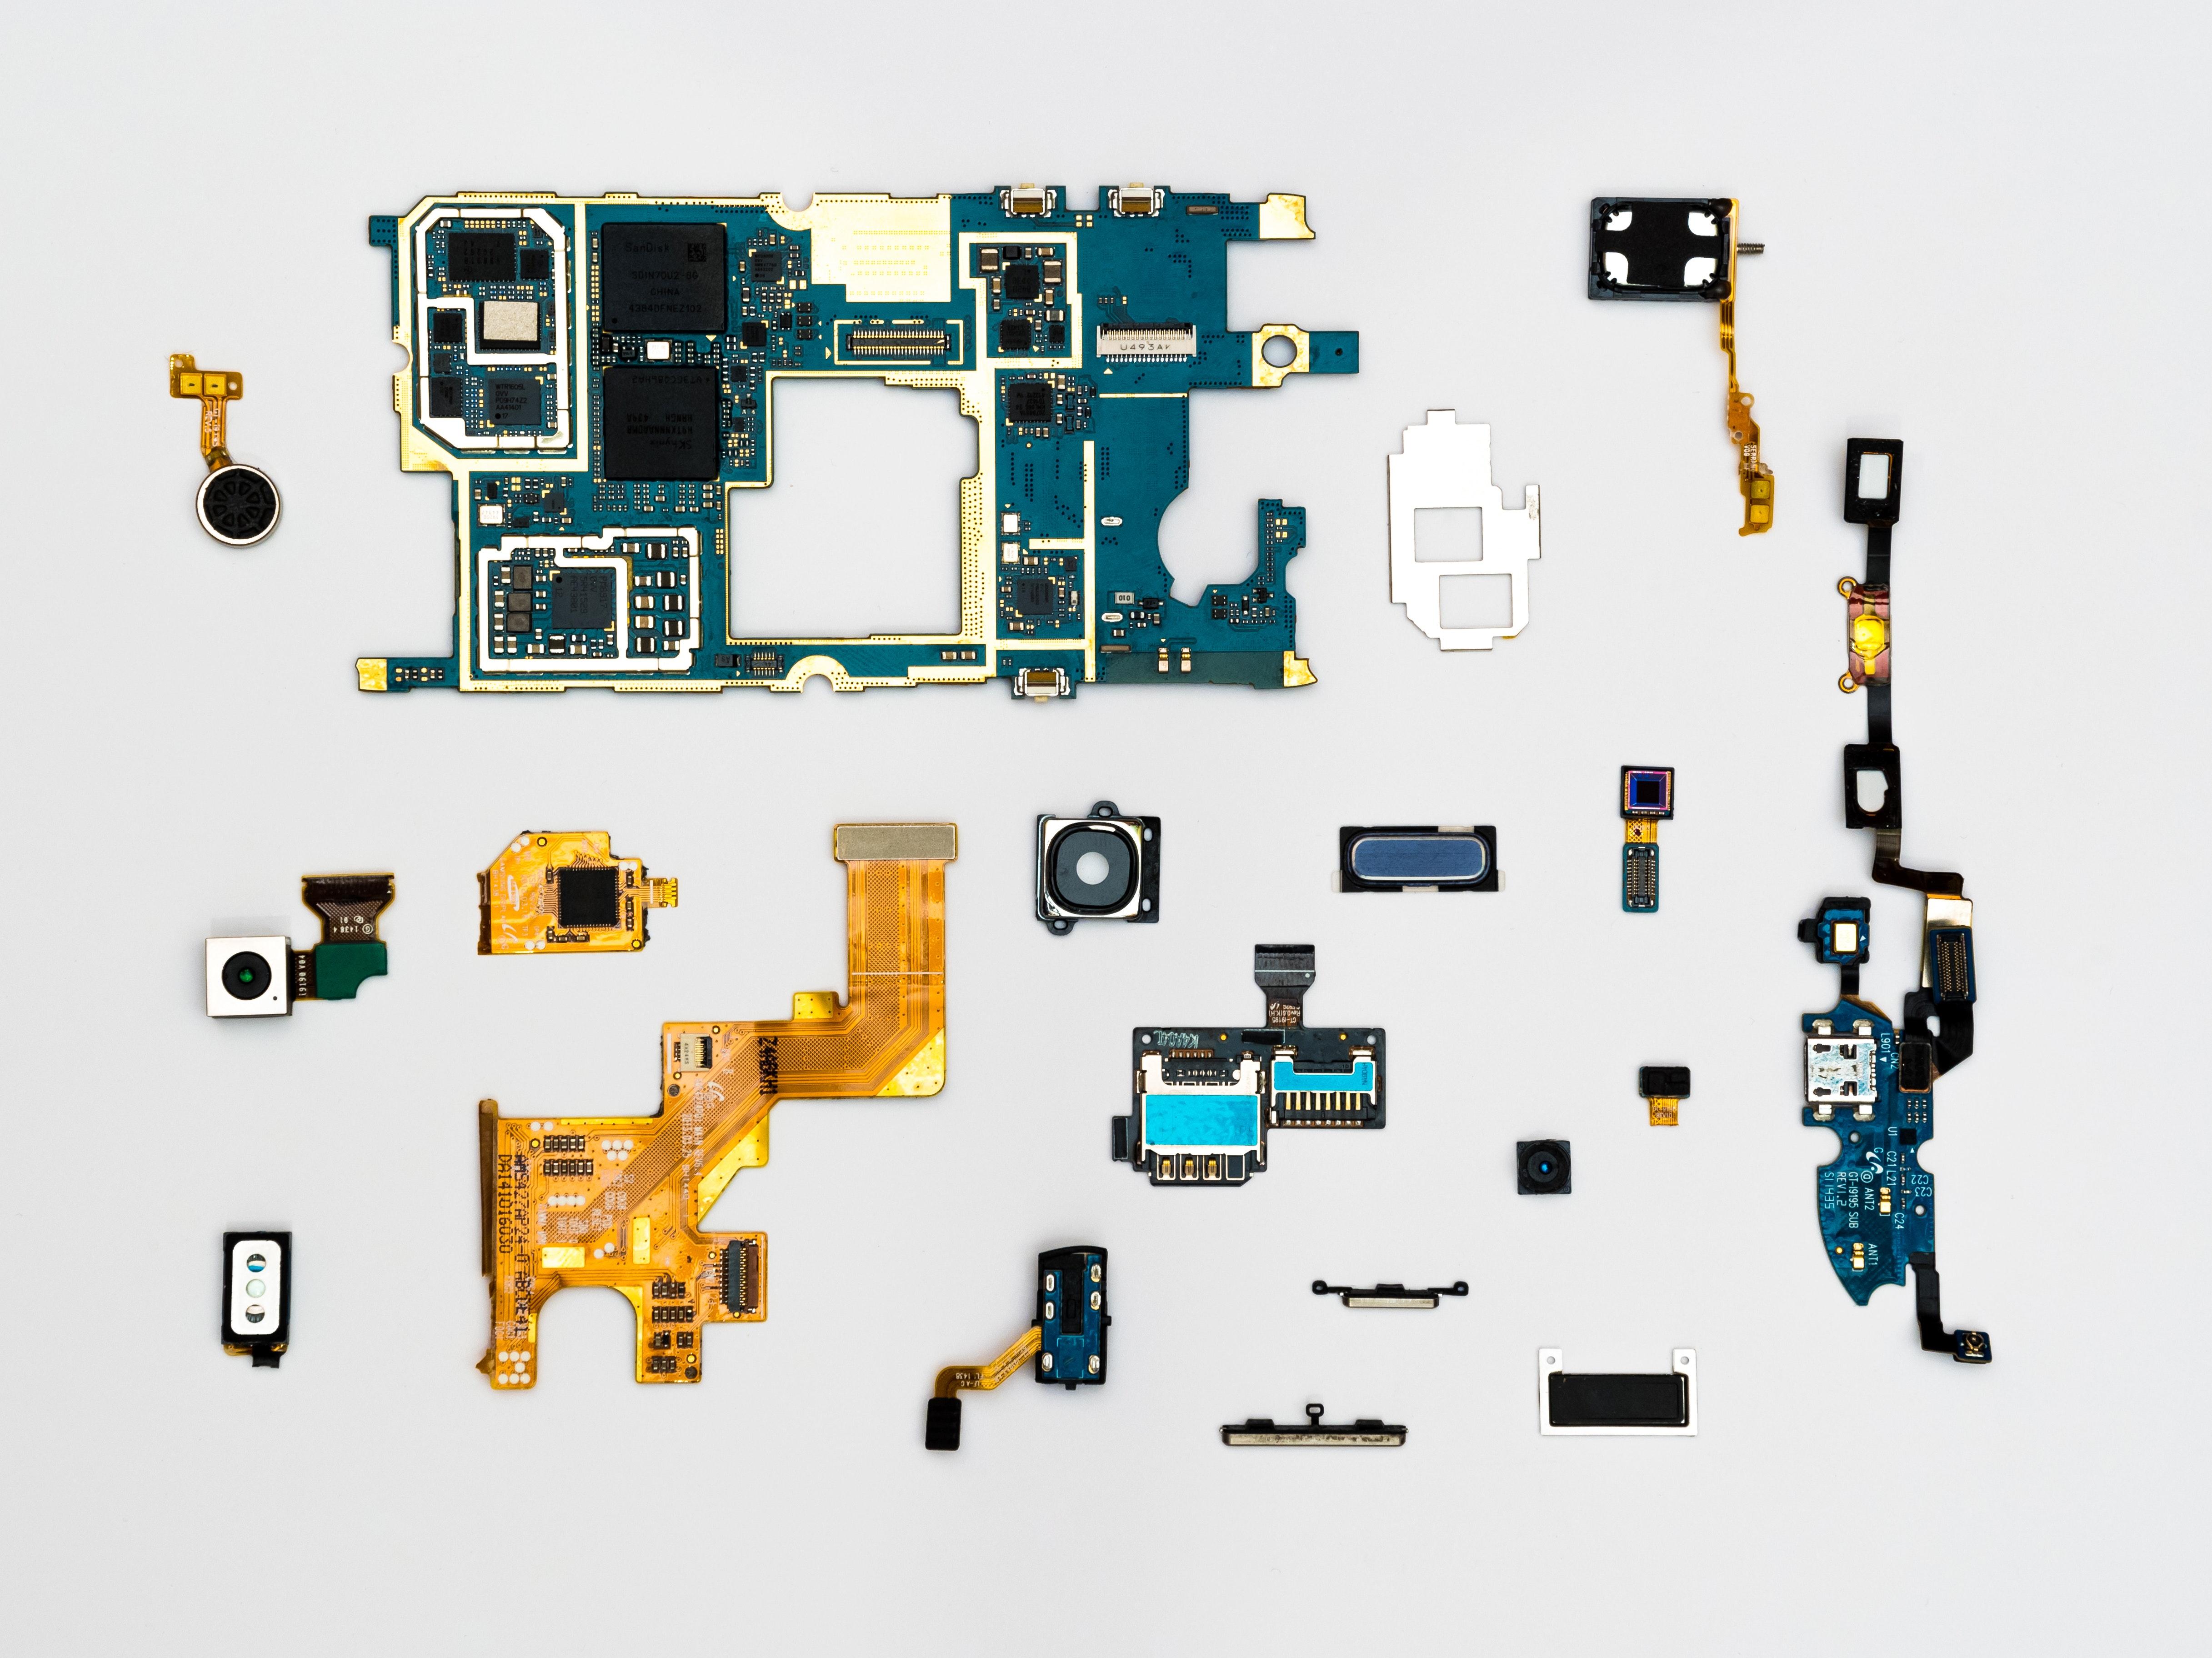 Short Circuit Diagram Http Wwwhobbycircuitscom Circuits Toolsand